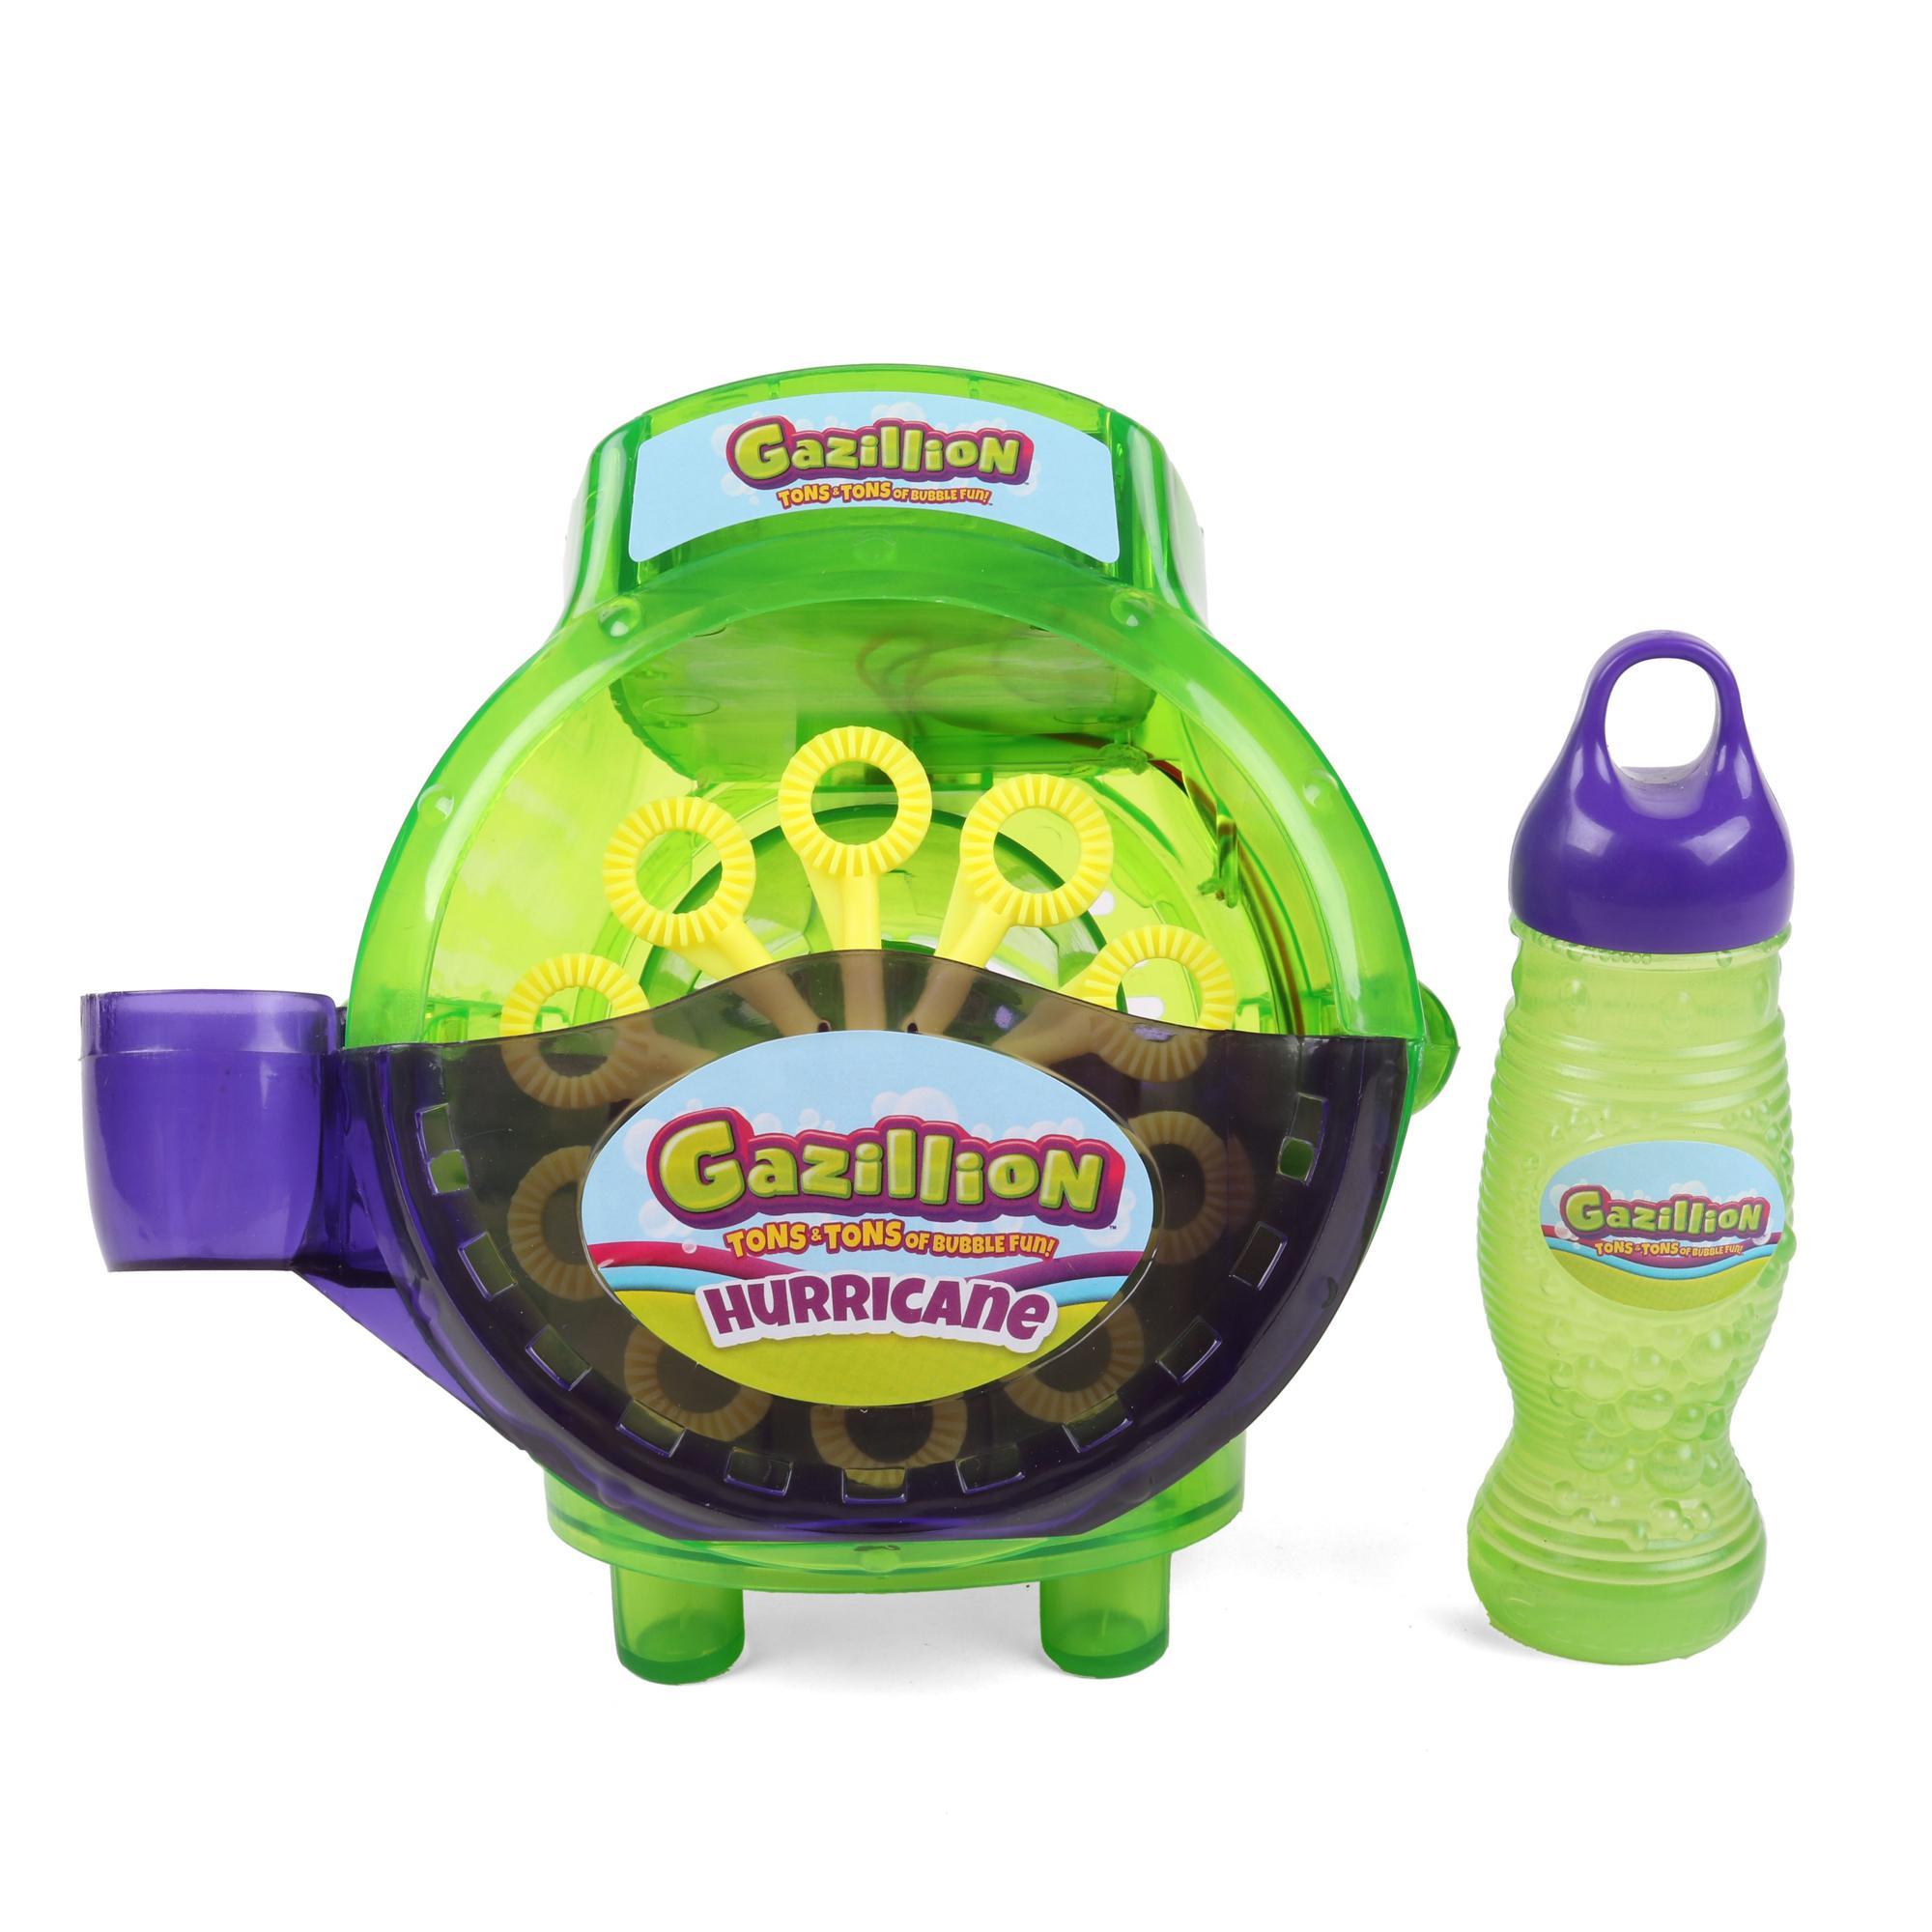 Funrise Toys - Gazillion Hurricane Bubble Machine